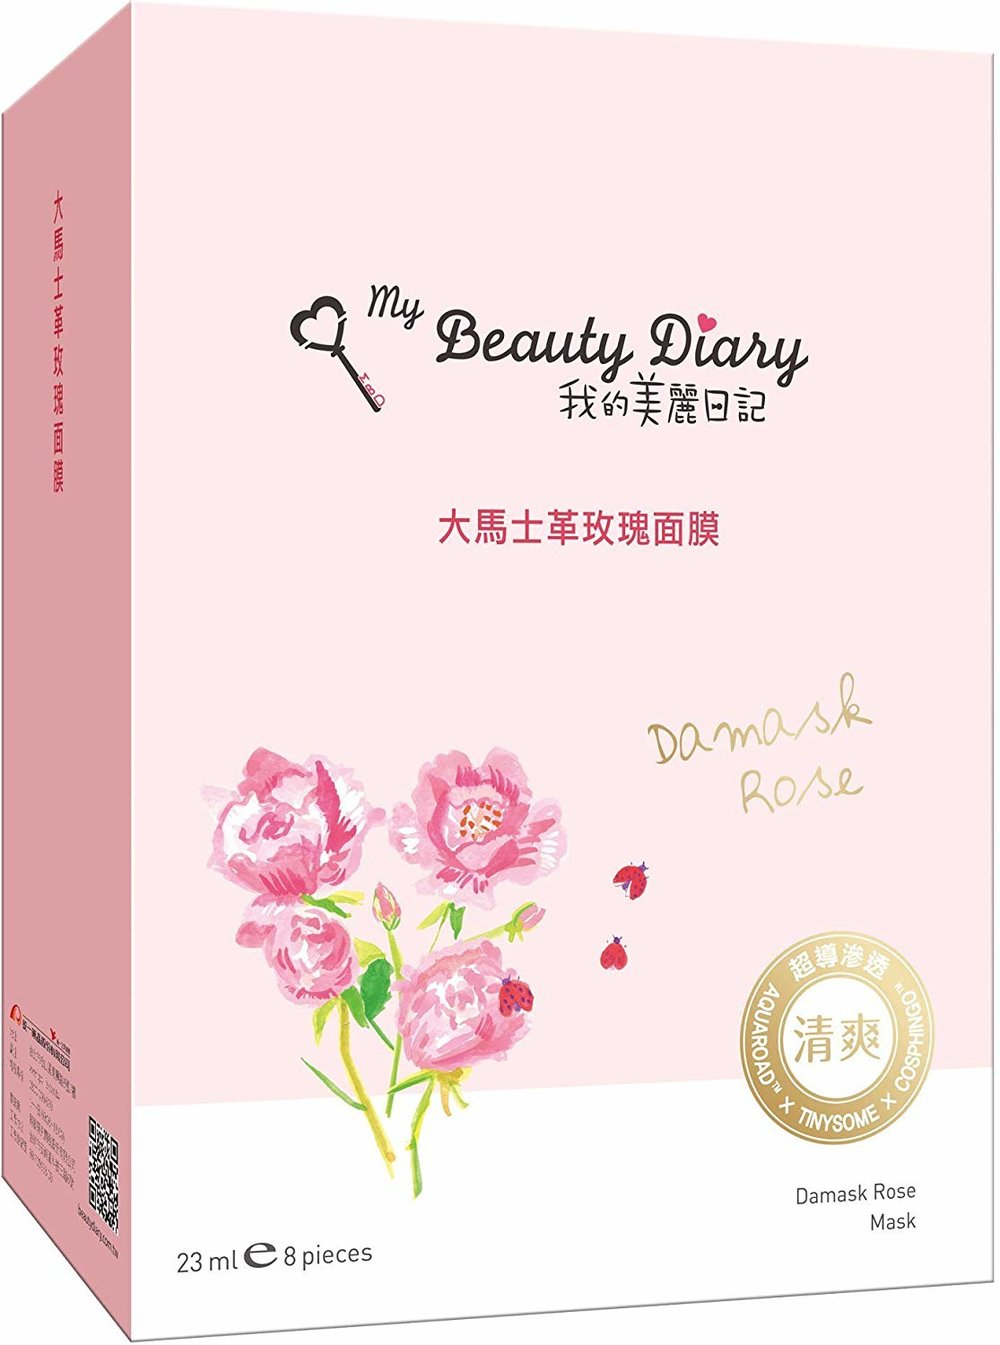 My Beauty Diary Mask - Damask Rose (Lightening & Hydrating) 8pcs - Photo courtesy of Amazon.